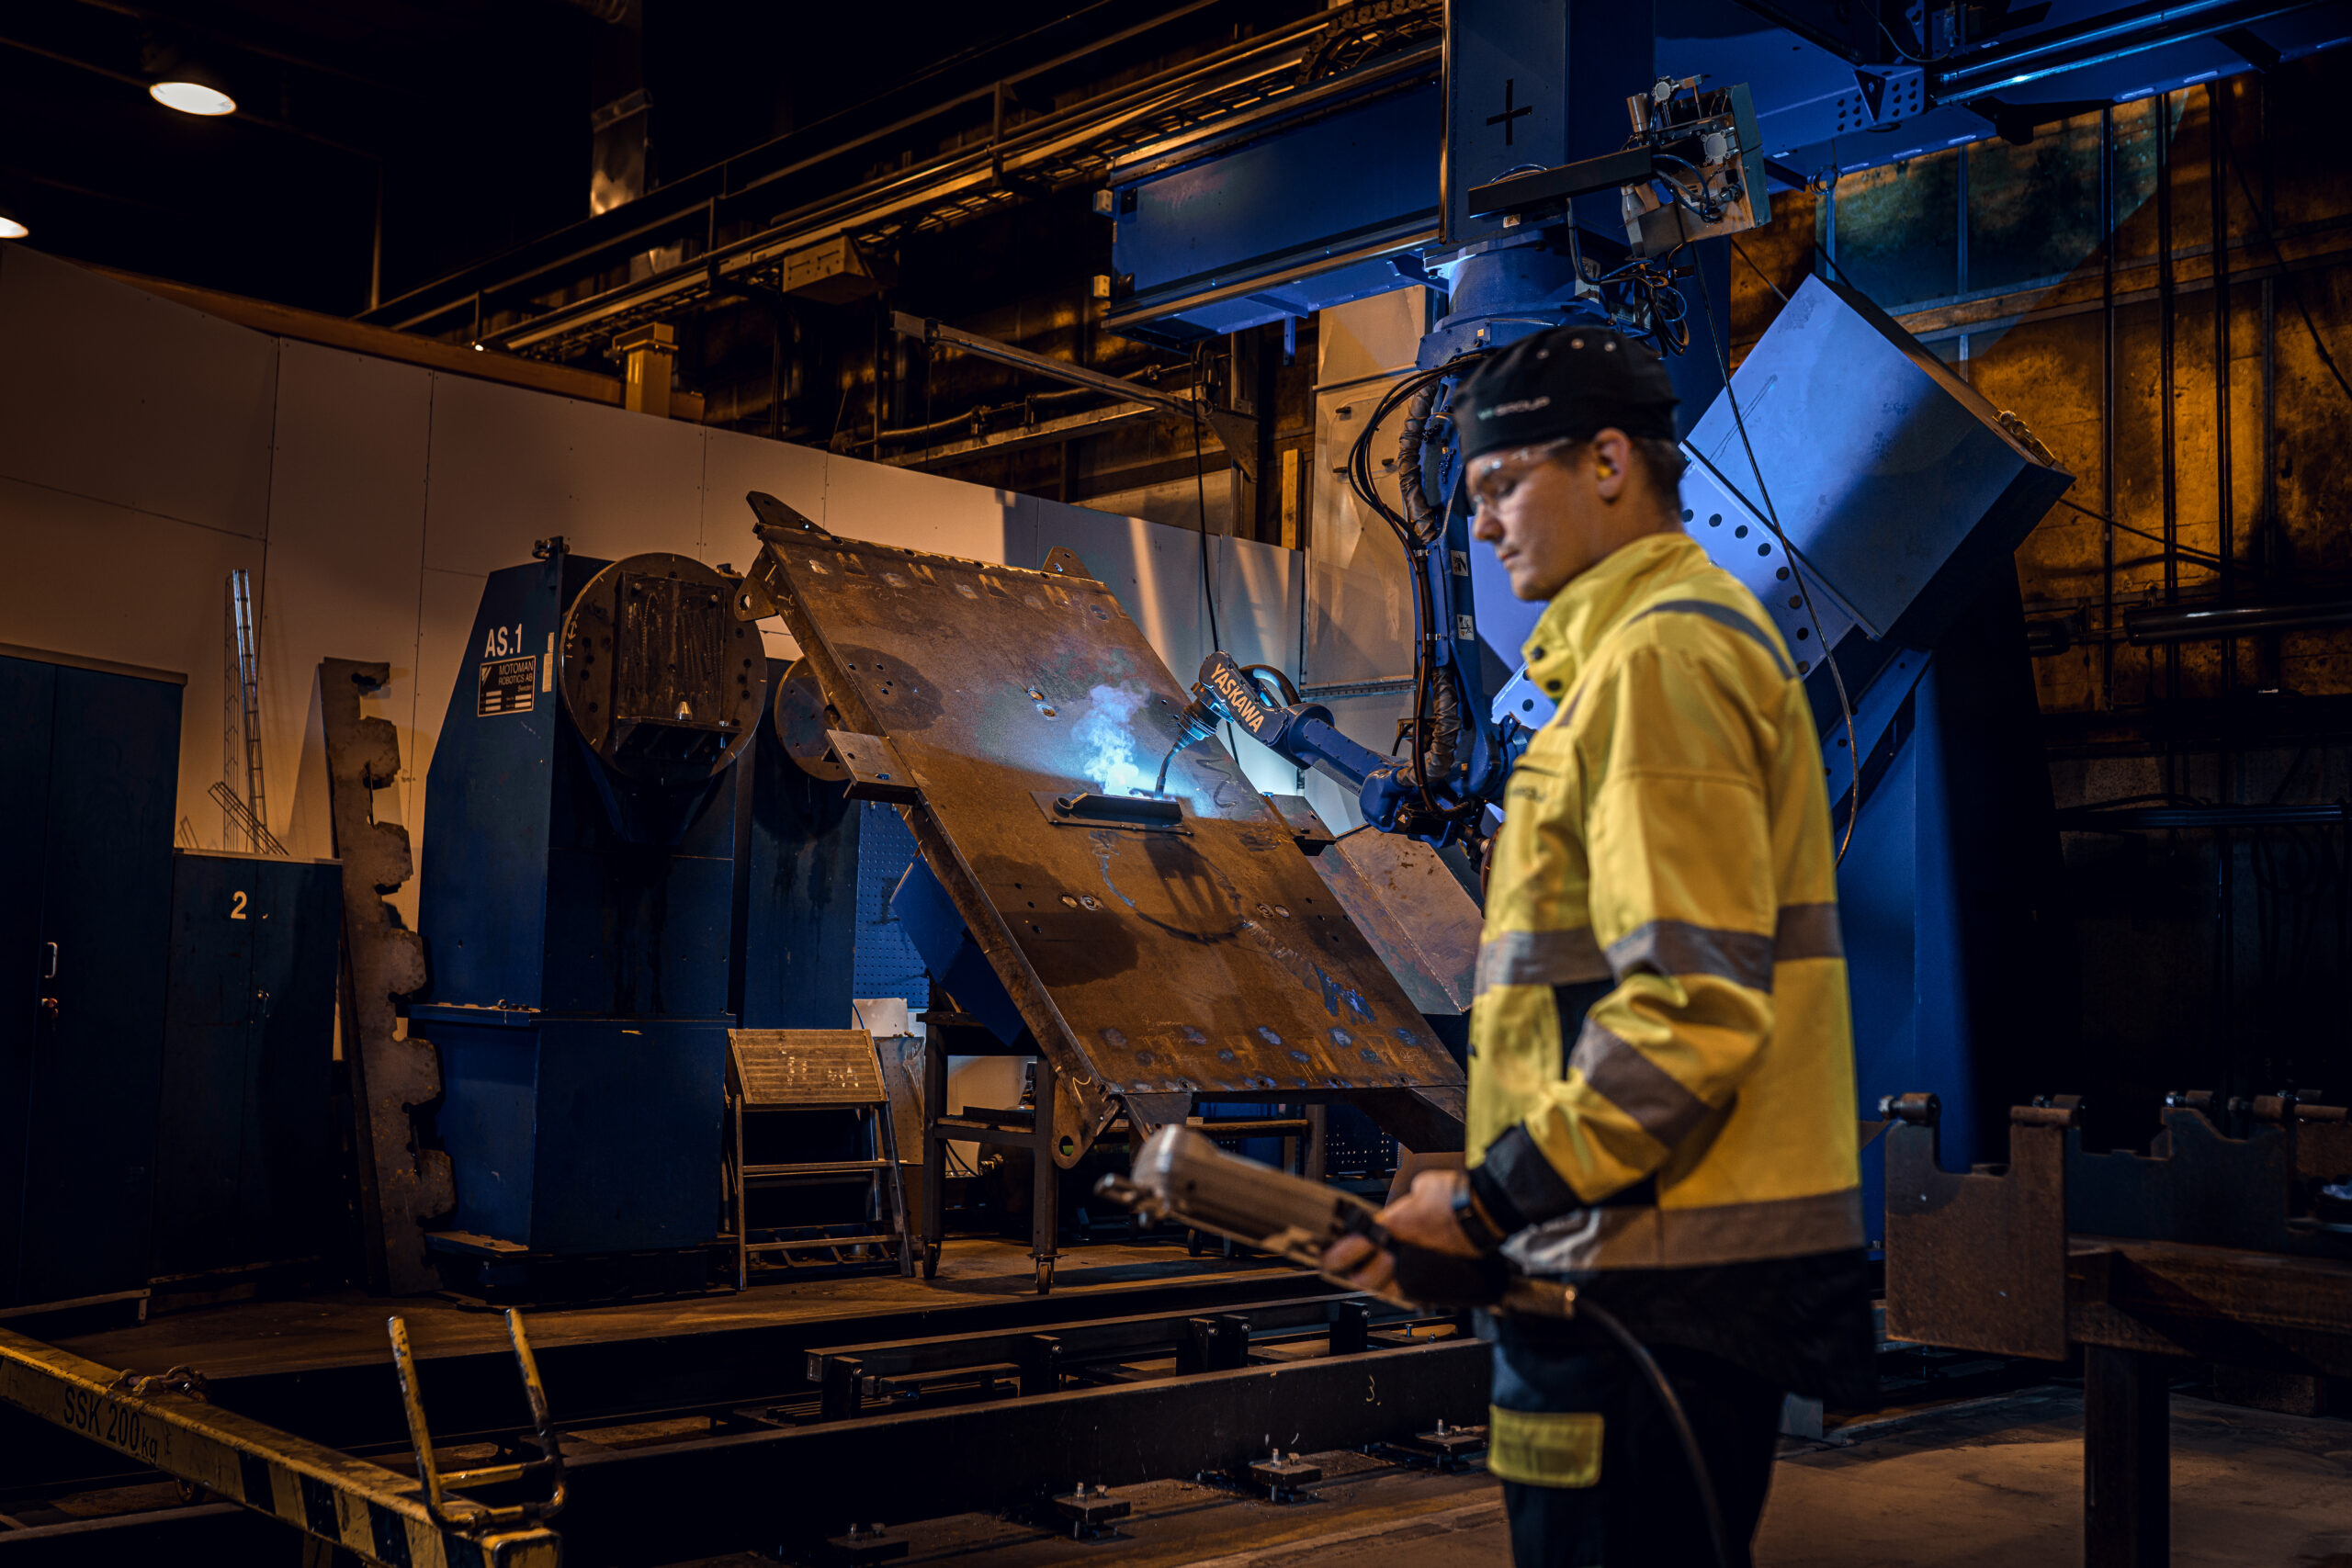 Reprogramming of the welding robot